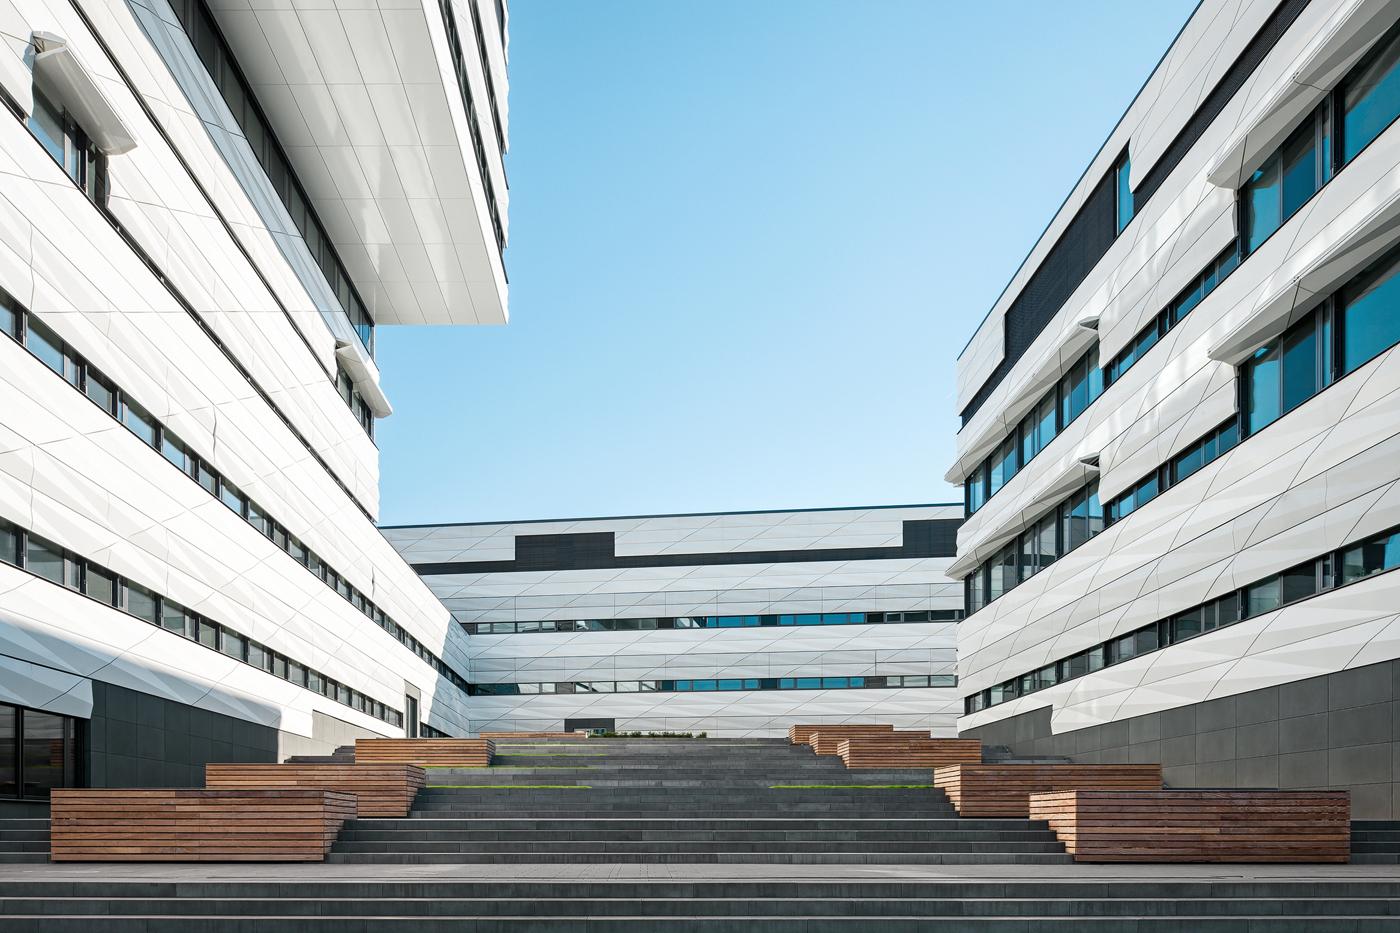 Sky Labs Heidelberg Tragwerksplaner imagine structure